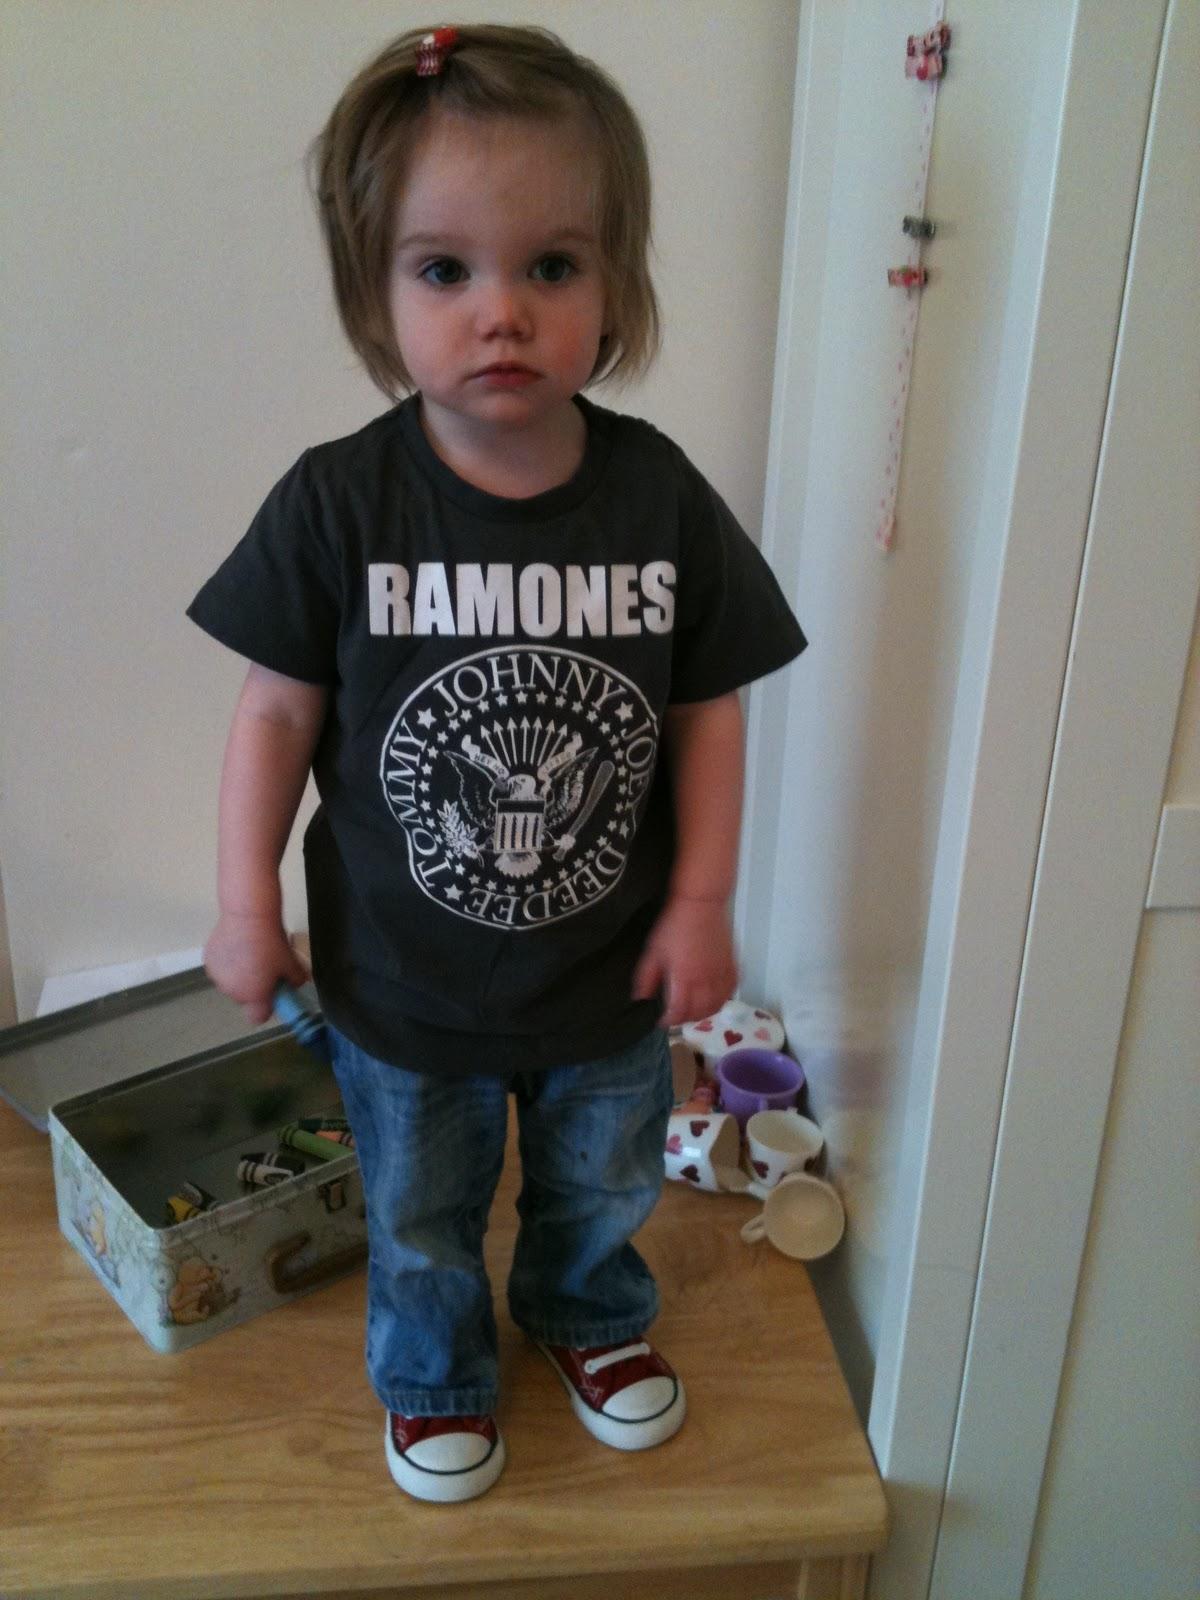 Child named Daisy wearing Ramones t-shirt